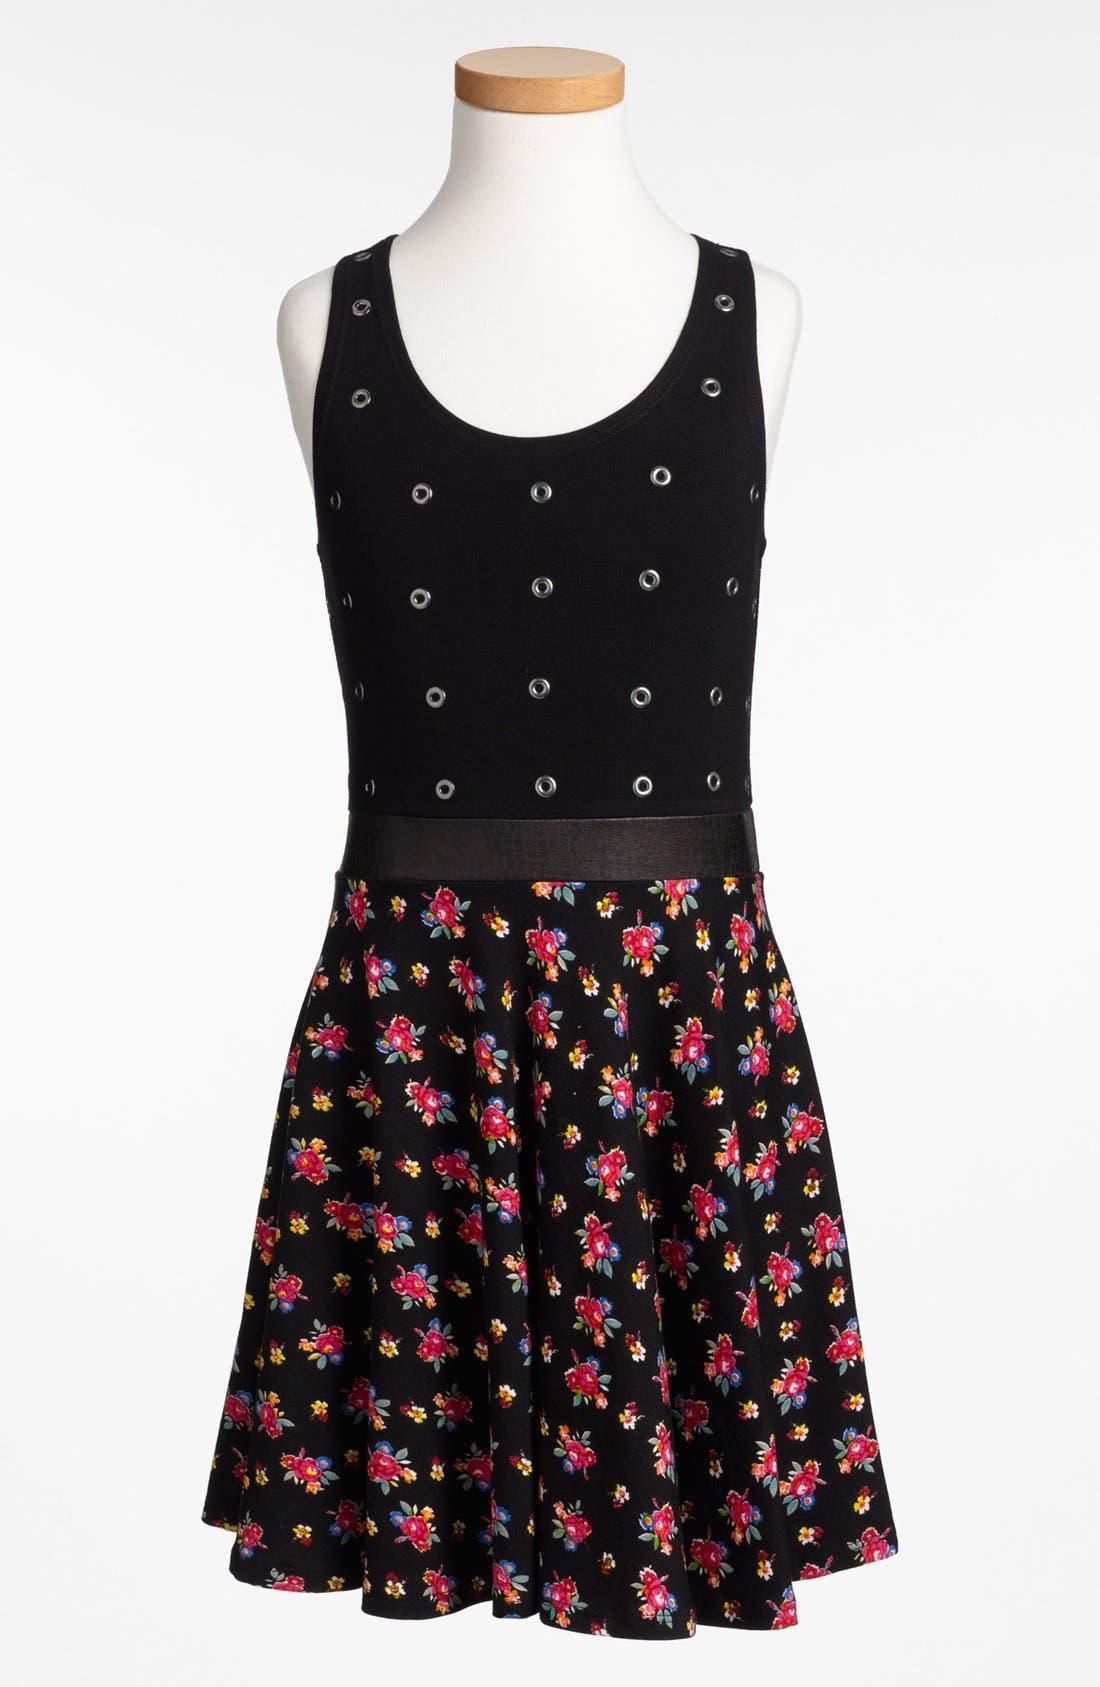 Alternate Image 1 Selected - Flowers by Zoe 'Grommets & Flowers' Dress (Big Girls)